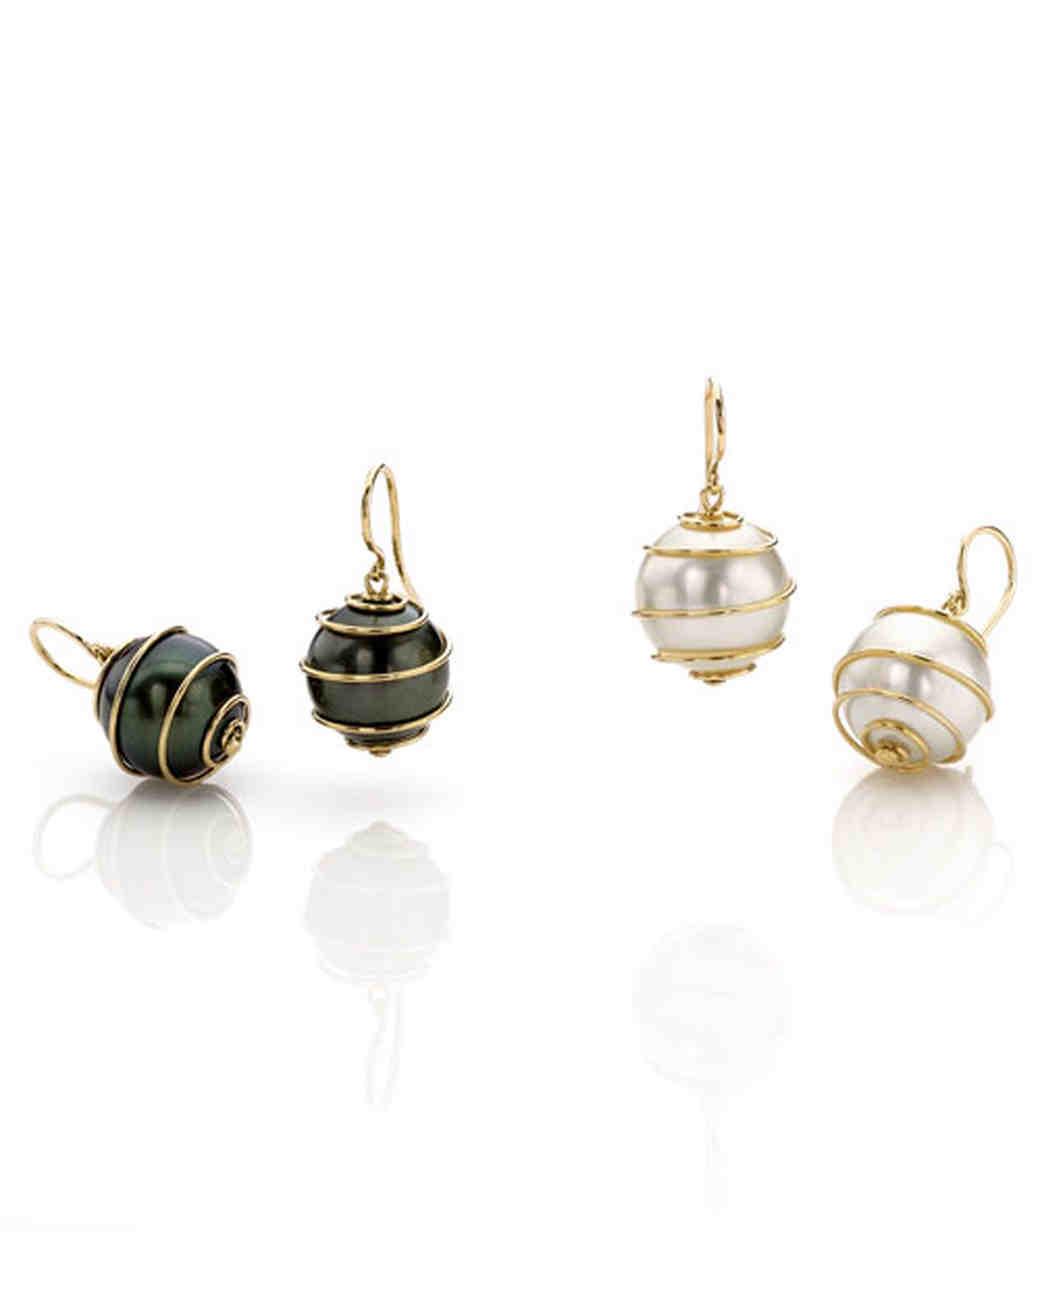 mish_ny_orbiting_pearl_earrings.jpg